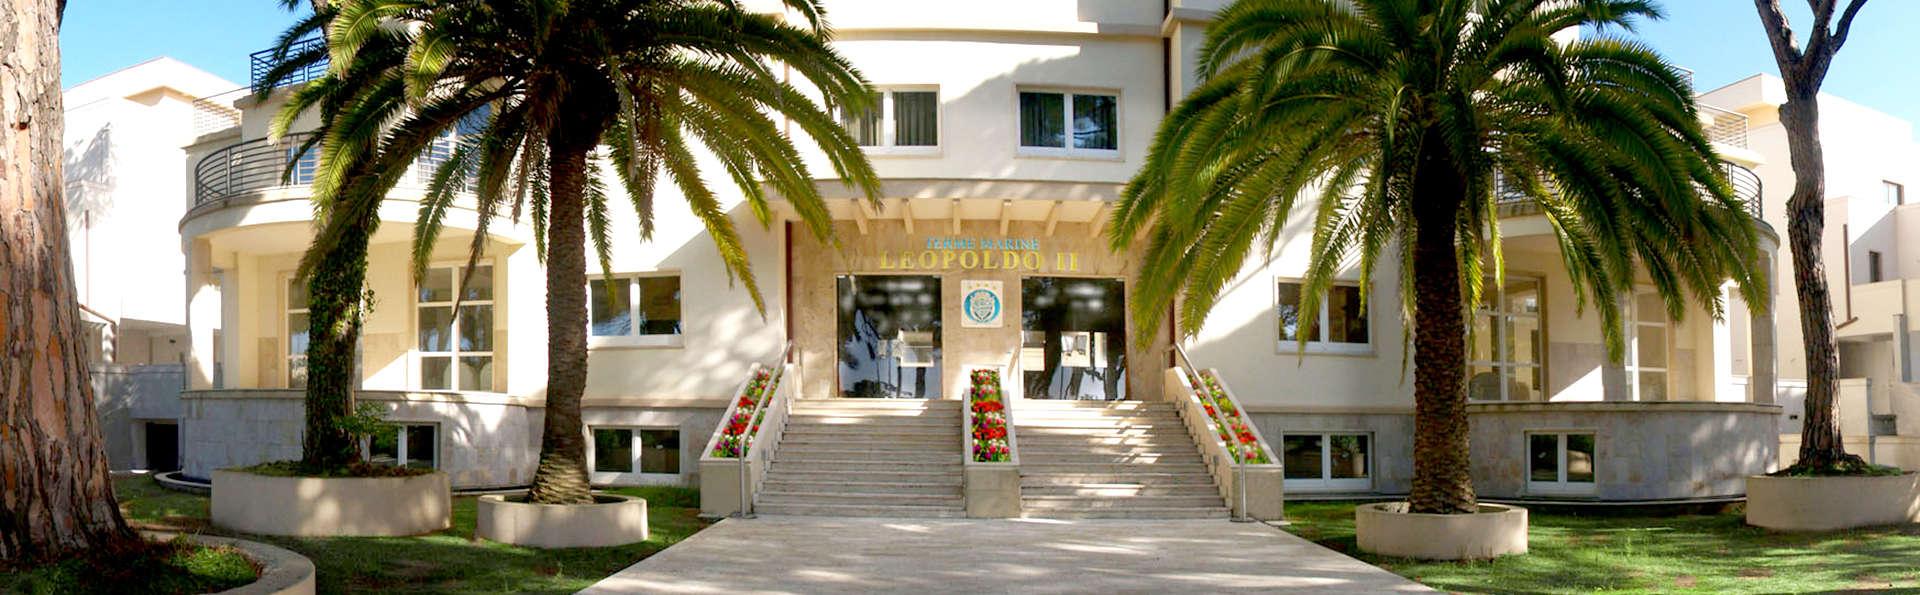 Grand Hotel Terme Marine Leopoldo II - Edit_Front2.jpg